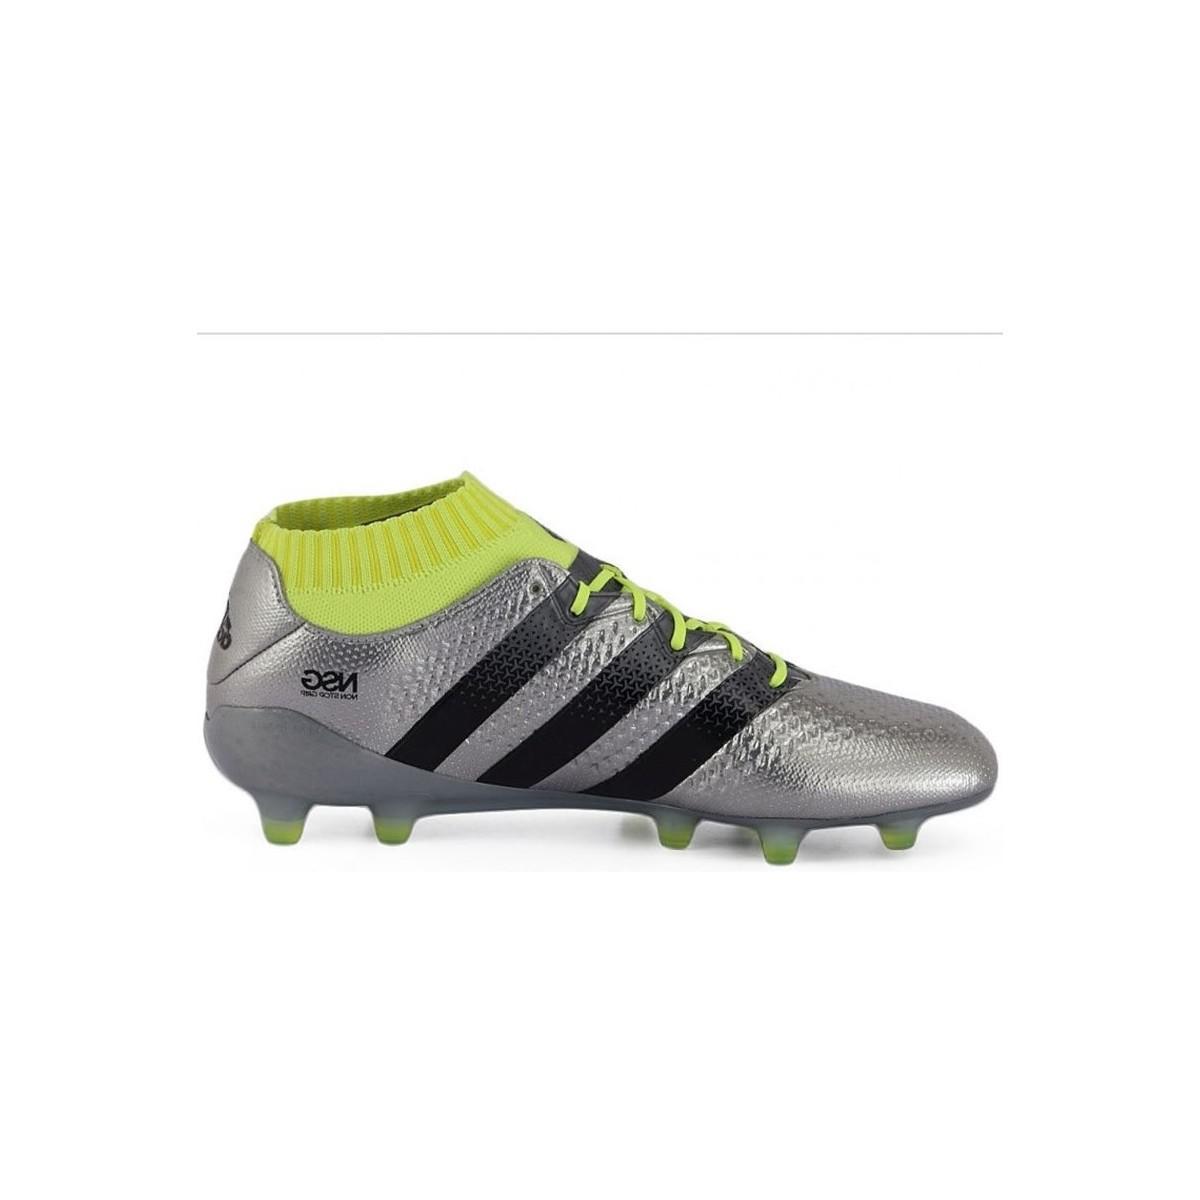 Adidas Ace 16 Primeknit Women s Football Boots In Multicolour - Lyst 2f976b3921